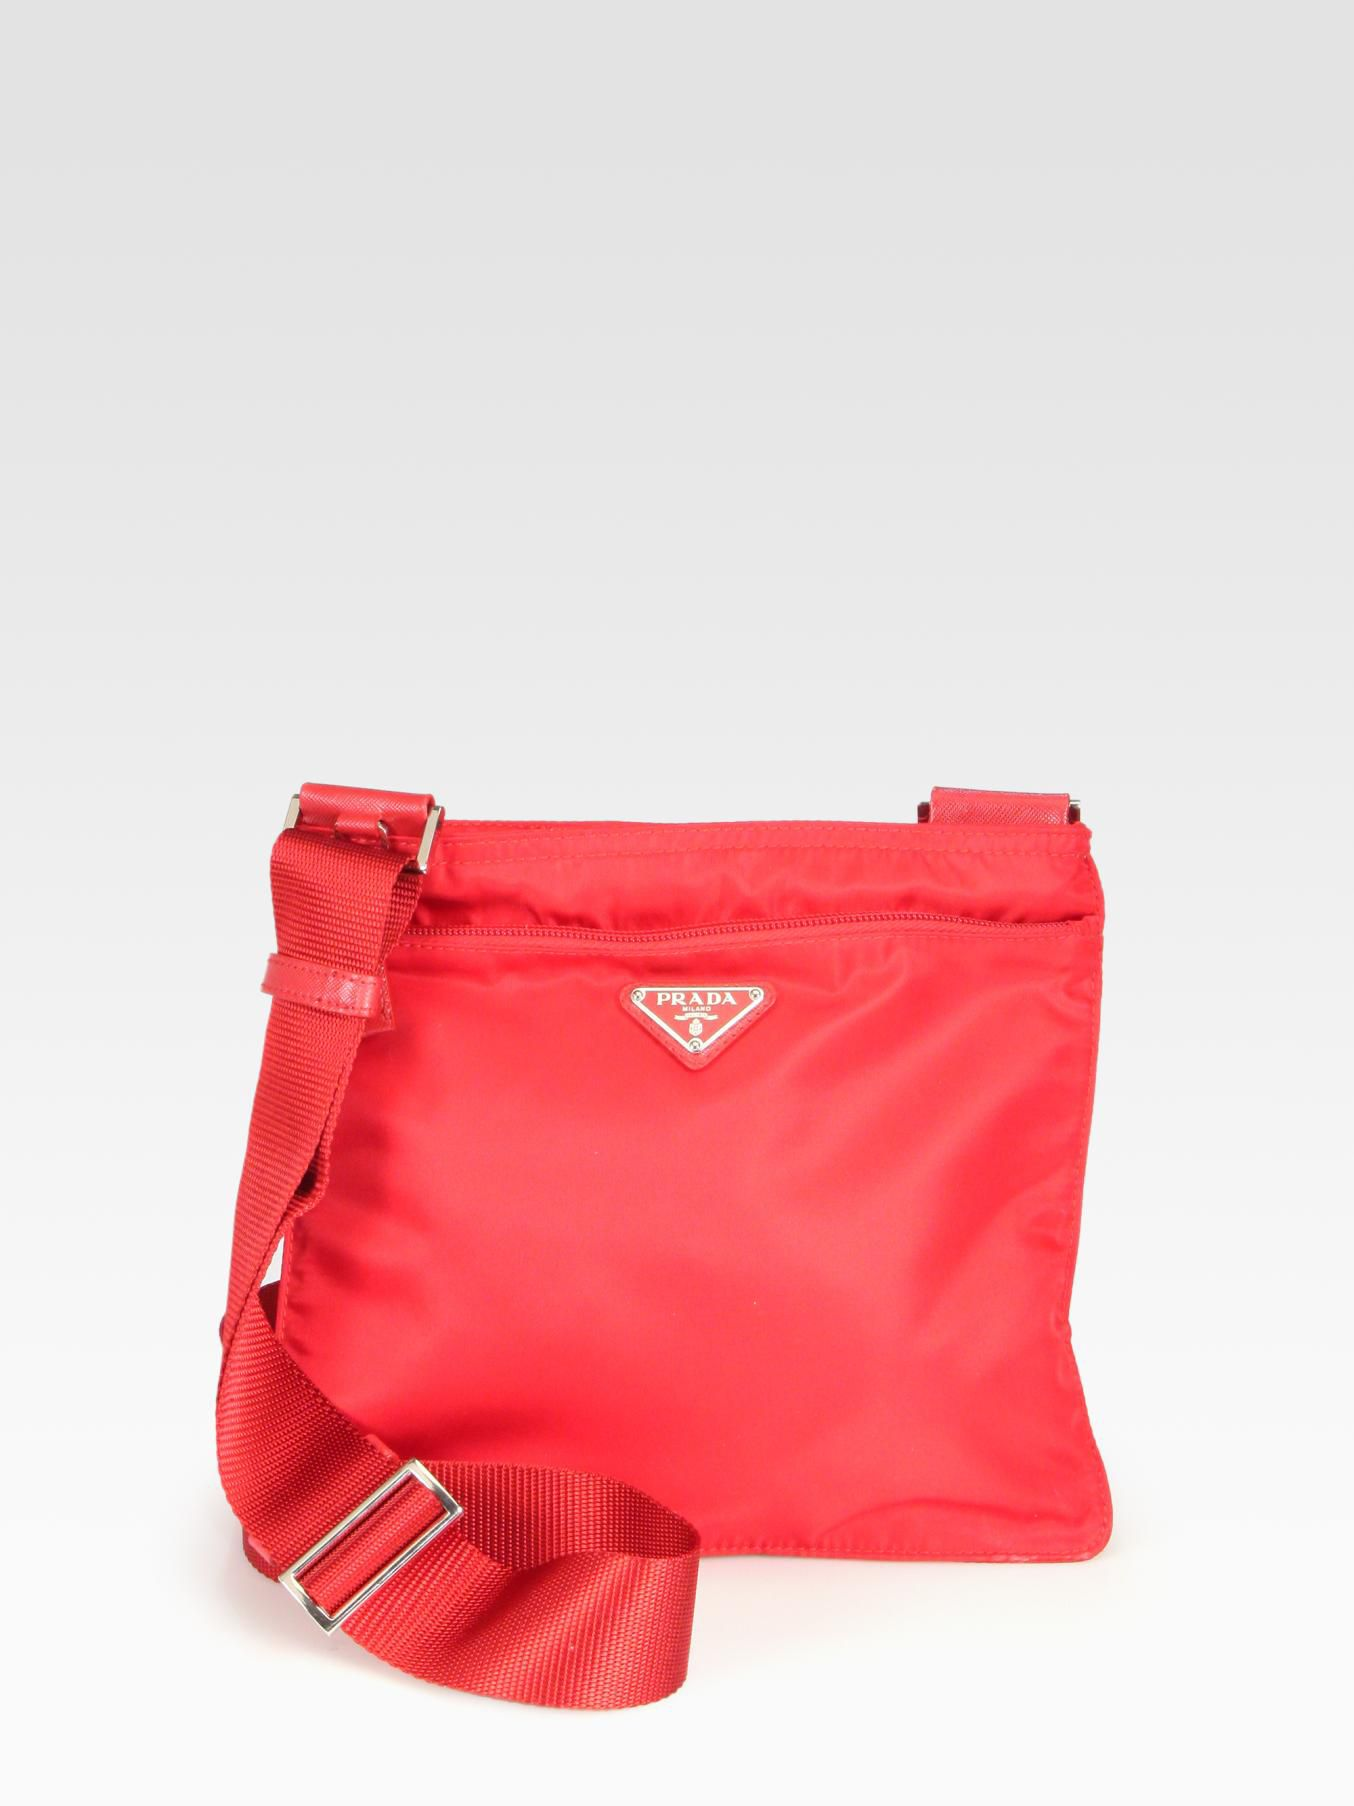 60331d356731 ... greece lyst prada nylon messenger bag in red 7c69b 05cff